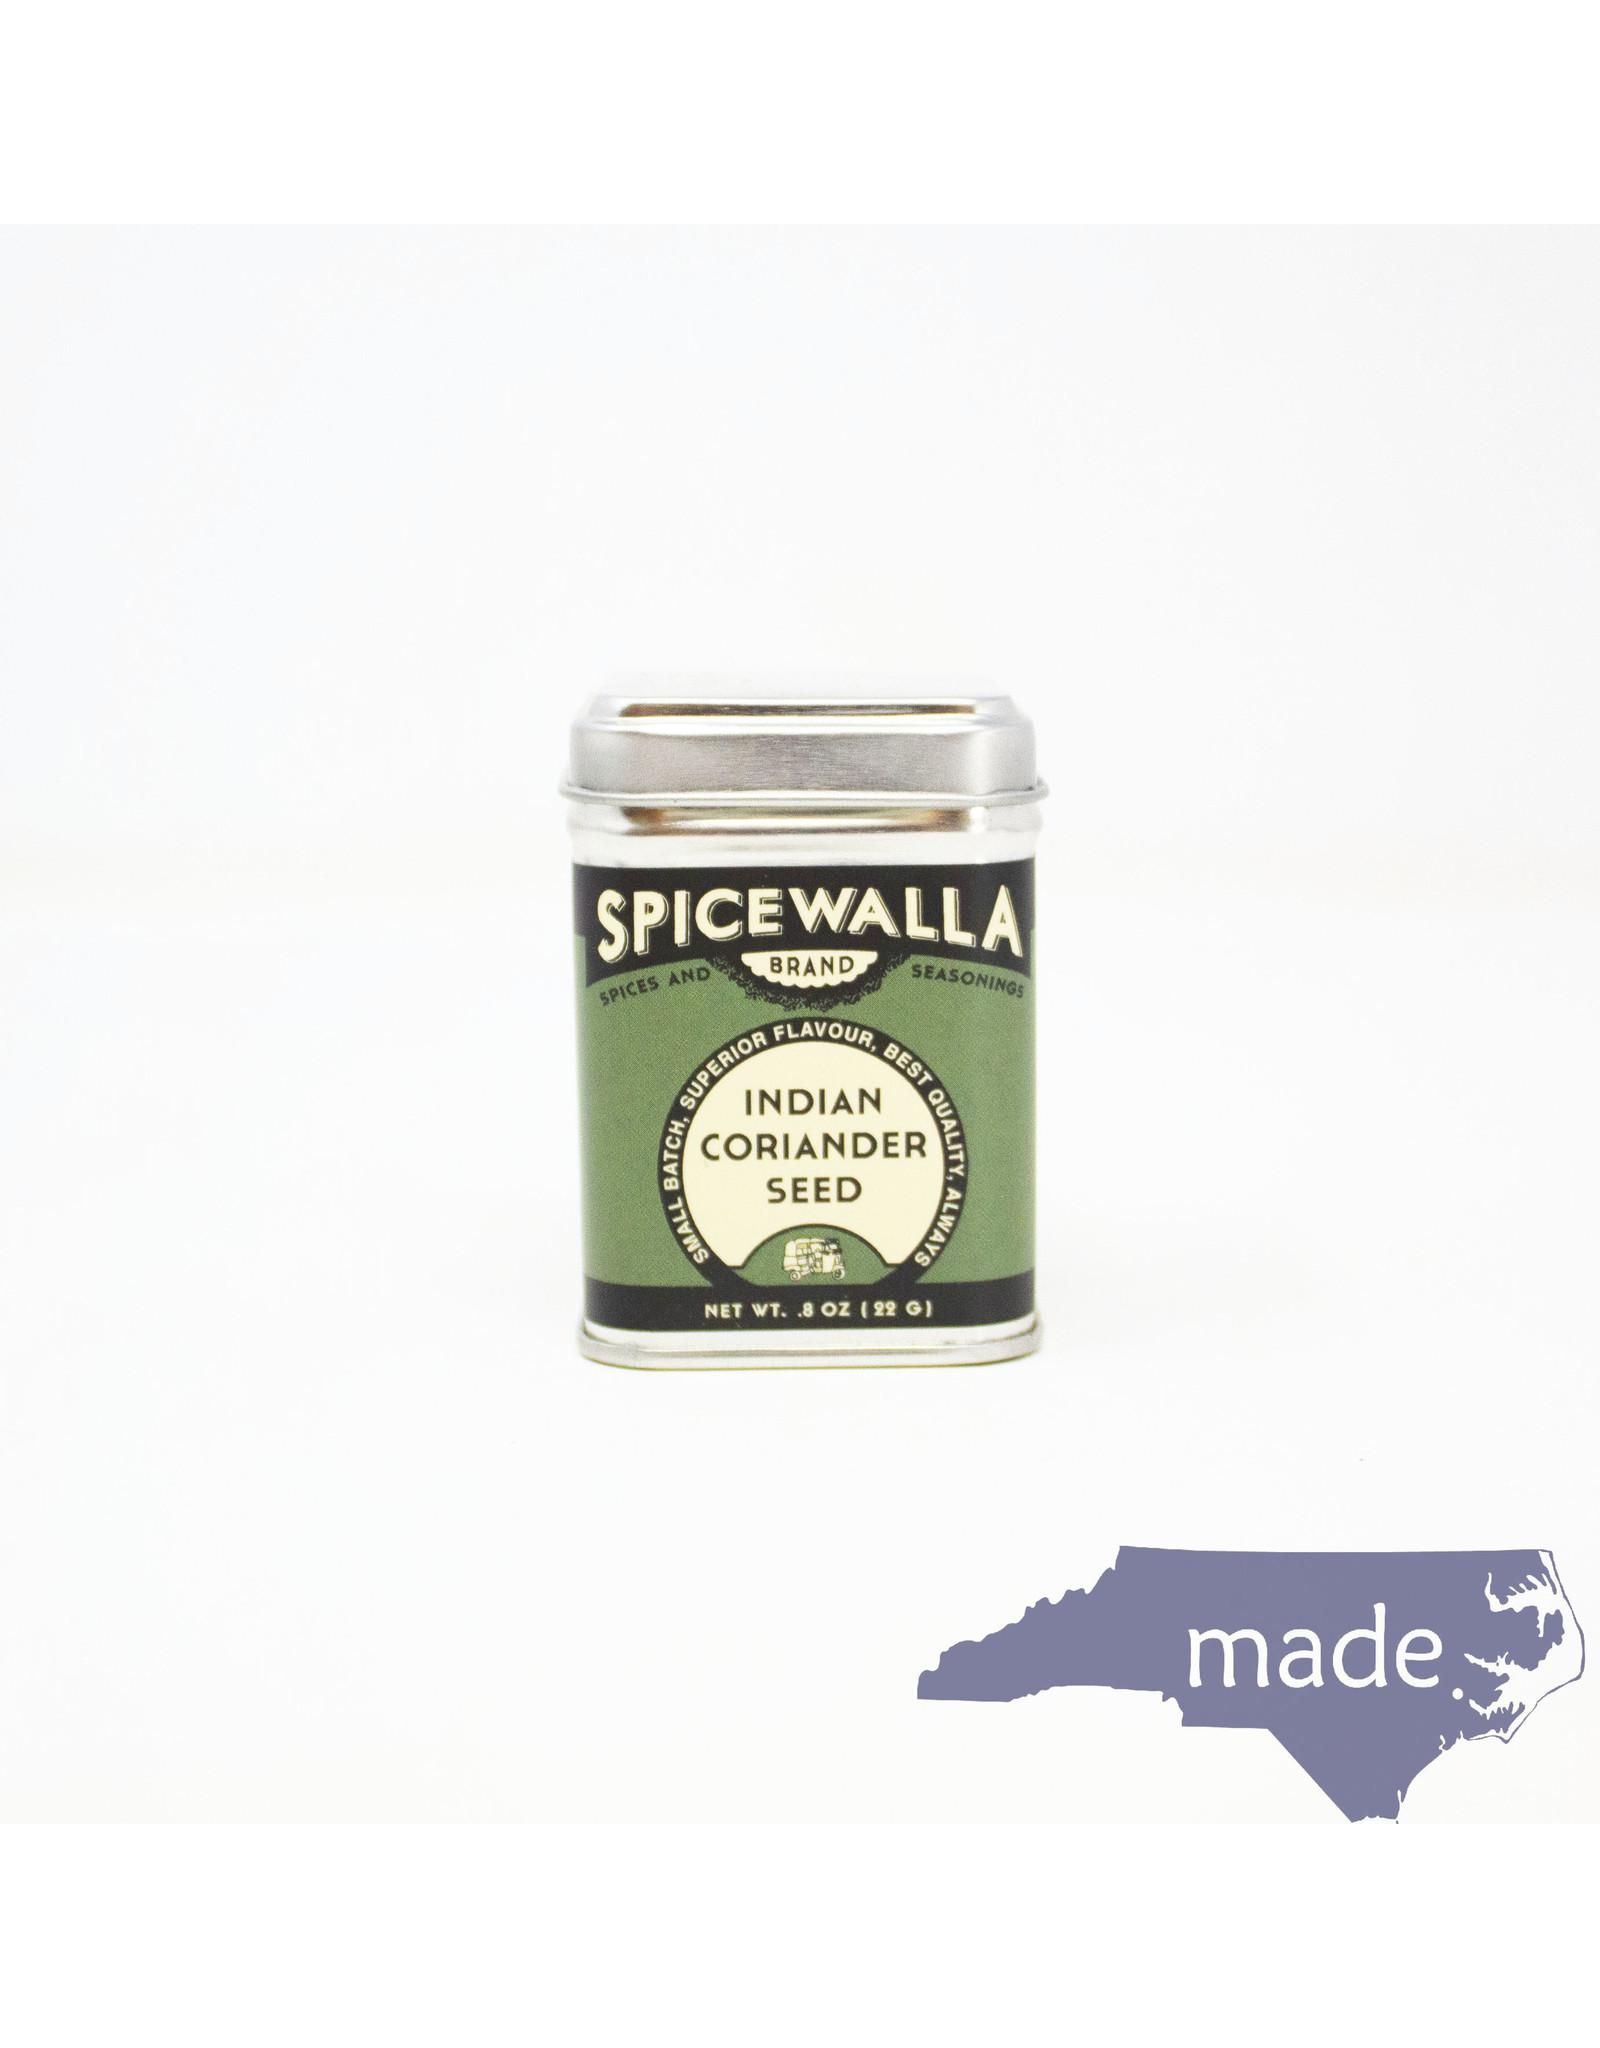 Spicewalla Indian Coriander Seed - Spicewalla